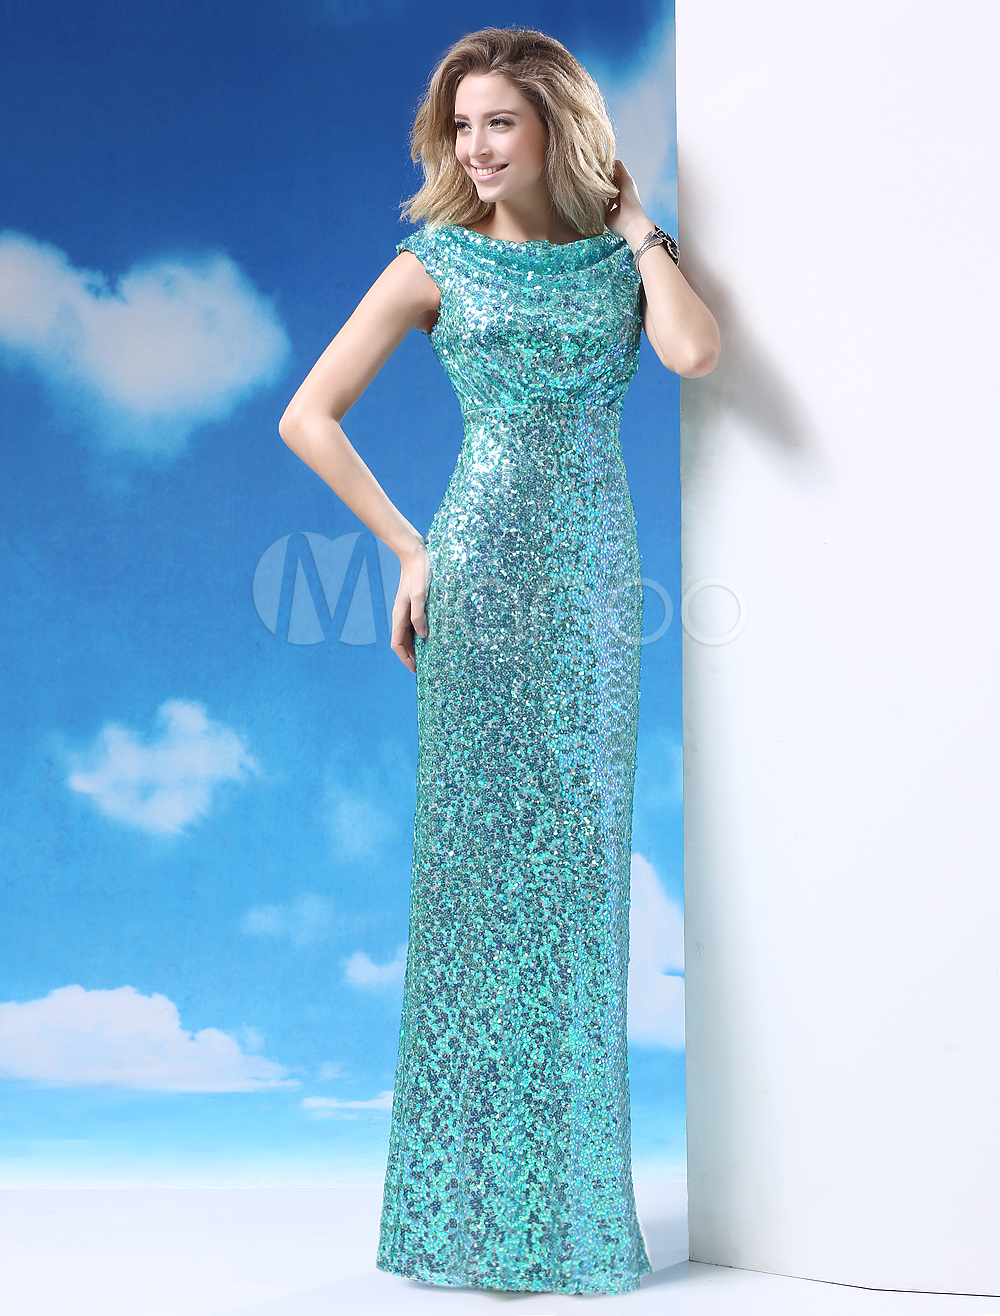 Ocean Blue Cowl Neck Sleeveless Sequin Sheath Prom Dress